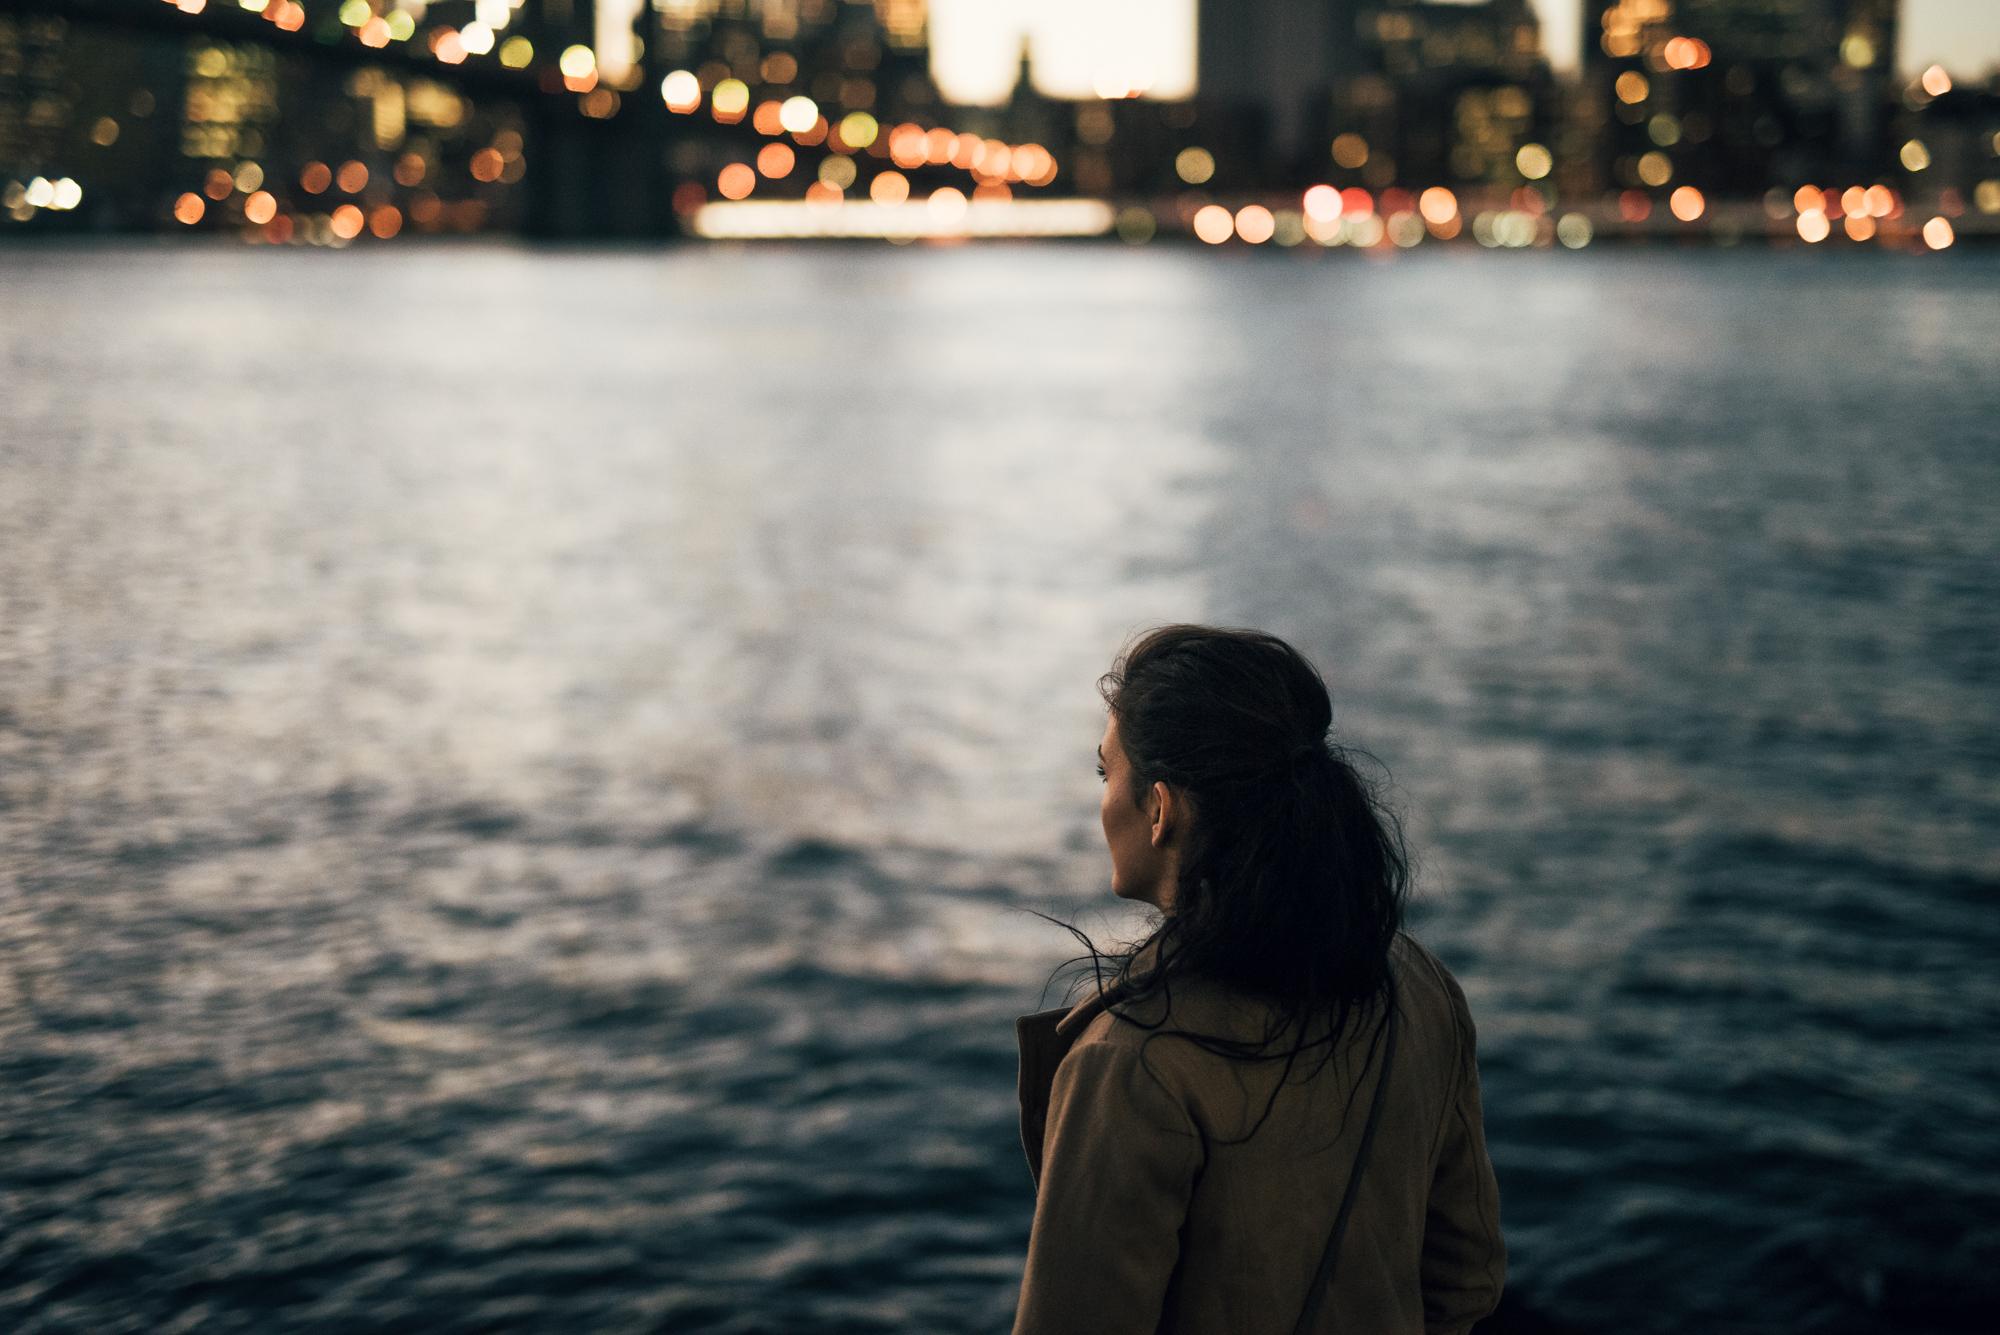 ©The Ryans Photography - NYC Night-007.jpg